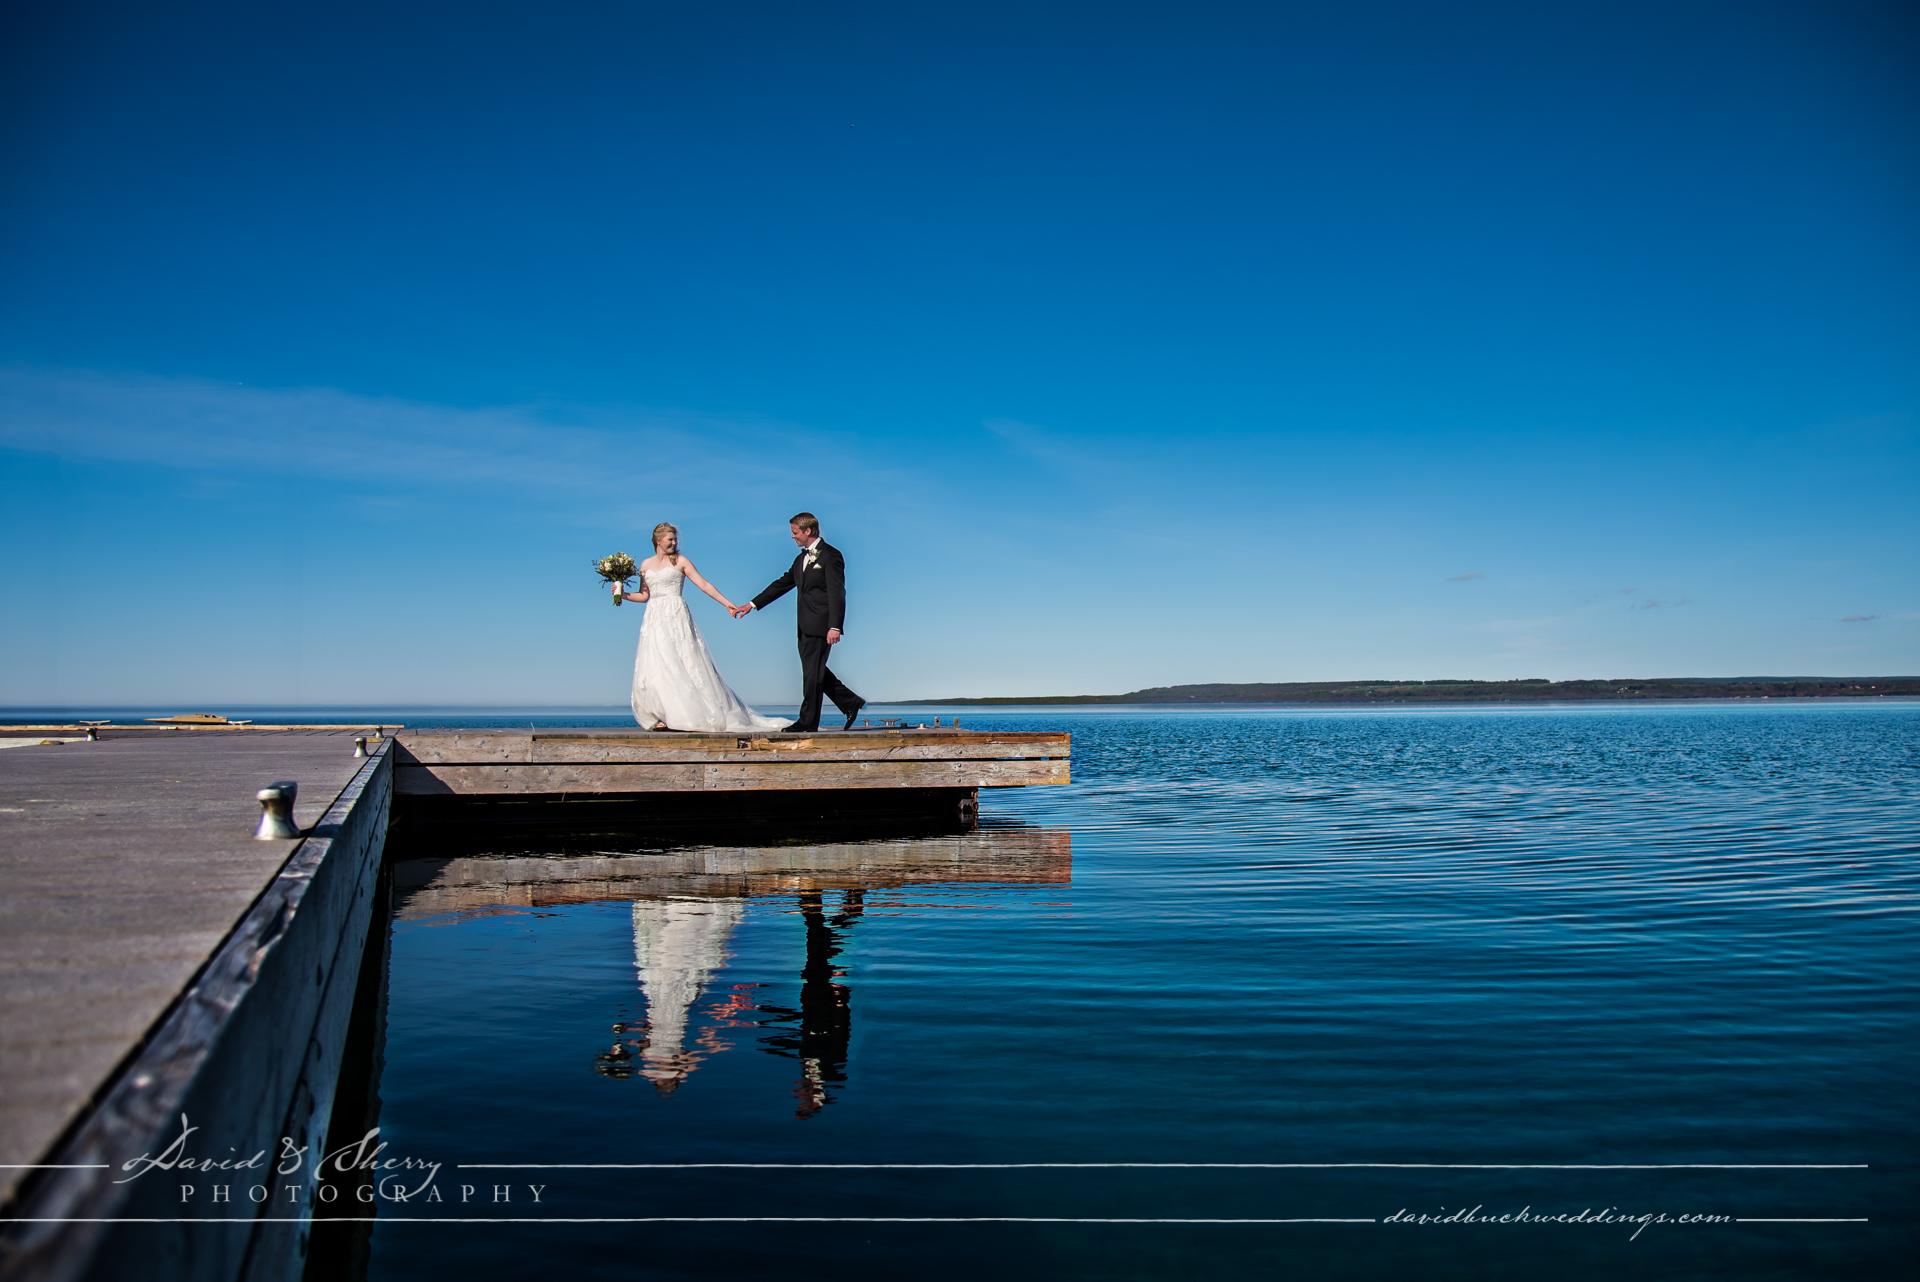 Cobble_Beach_Wedding_Photography_20